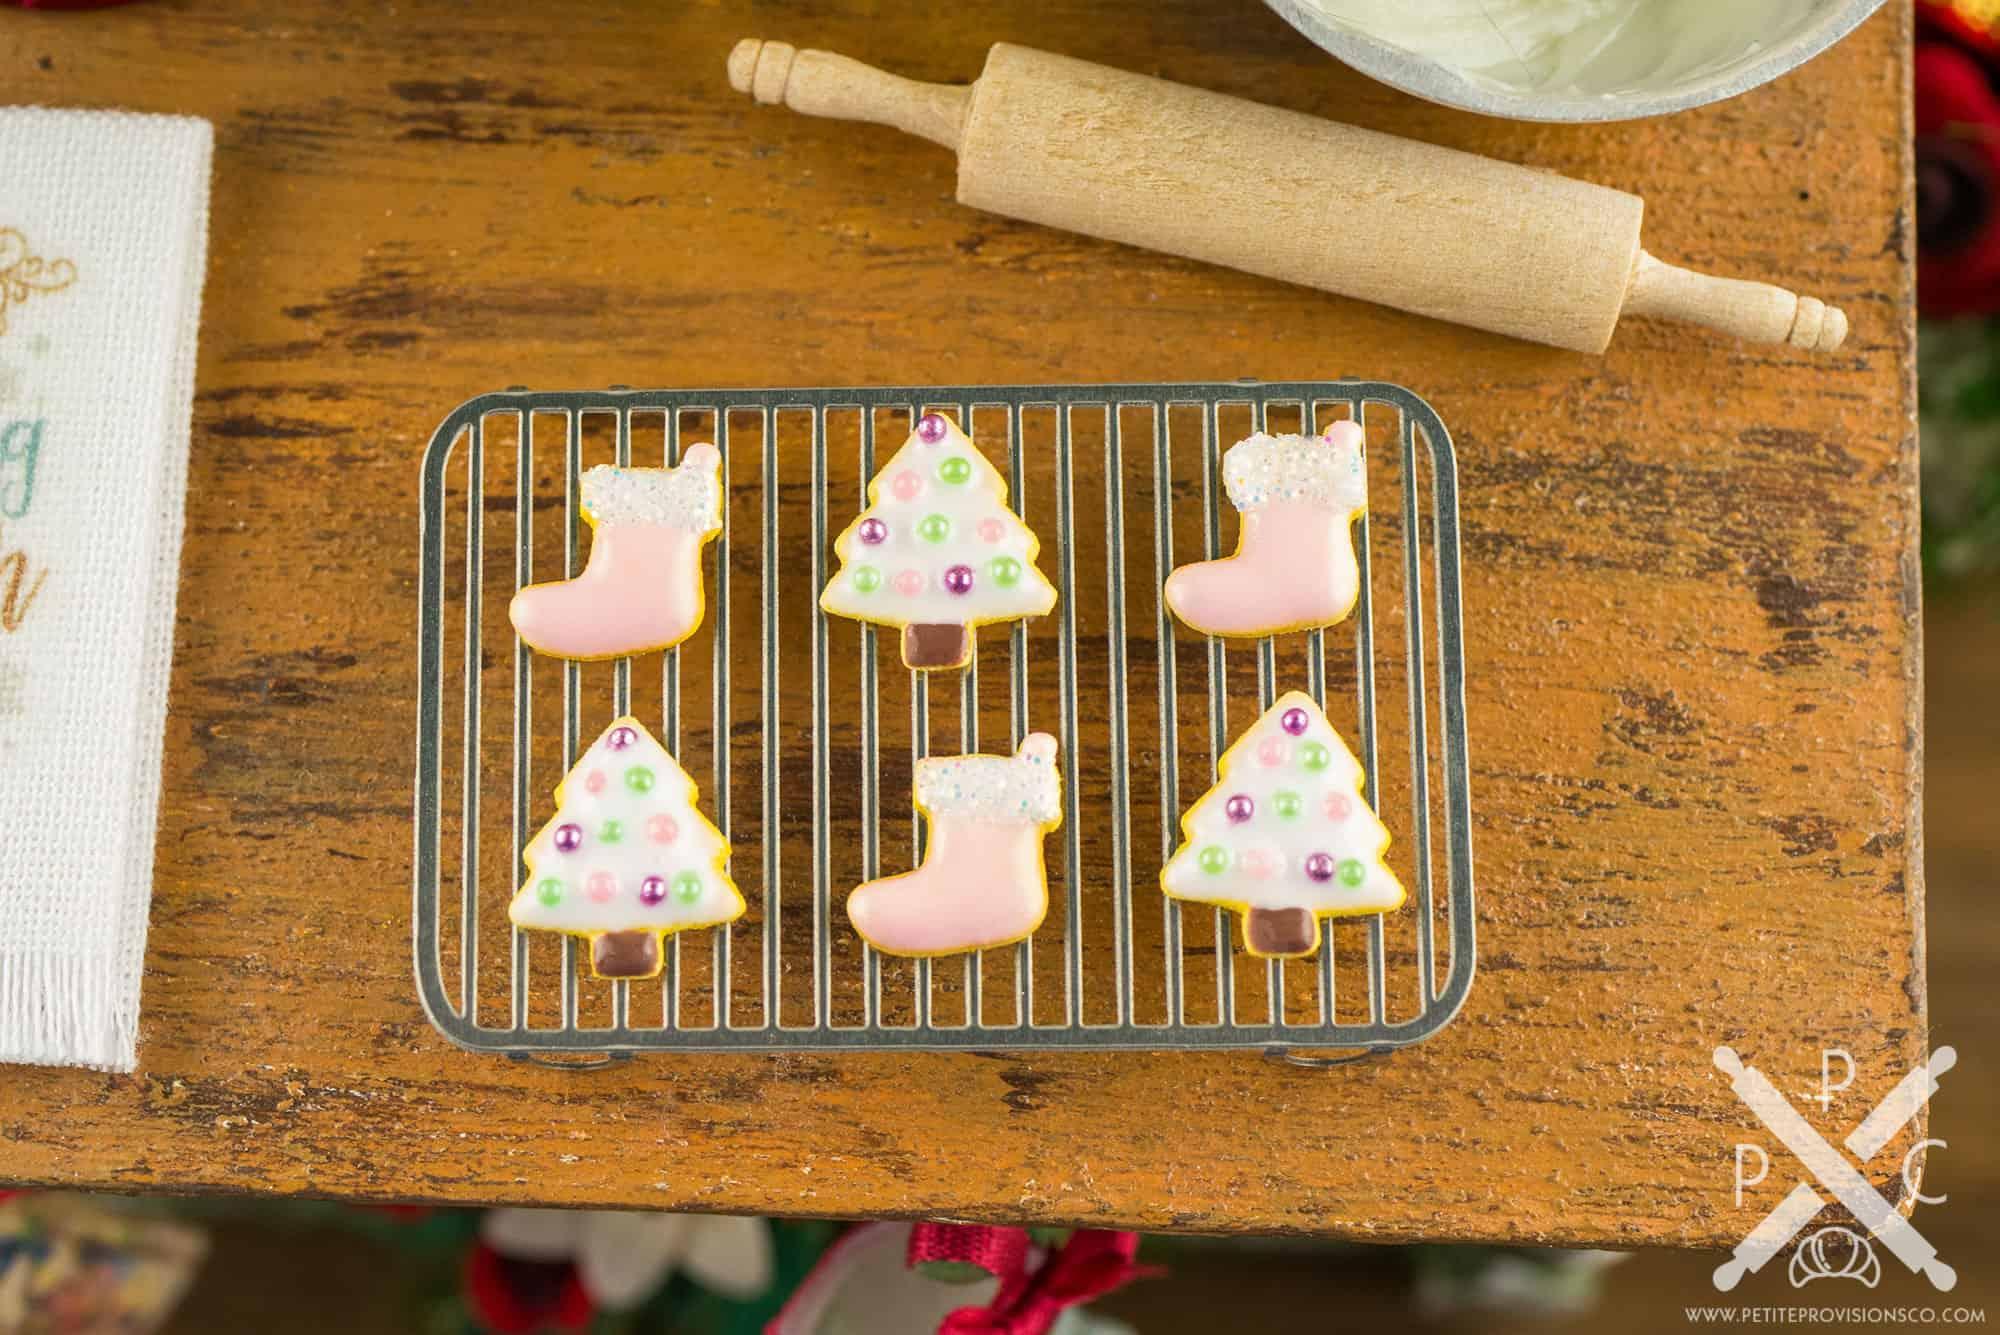 Dollhouse Miniature White Christmas Trees And Pink Stockings Cookies Half Dozen 1 12 Dollhouse Miniature The Petite Provisions Co